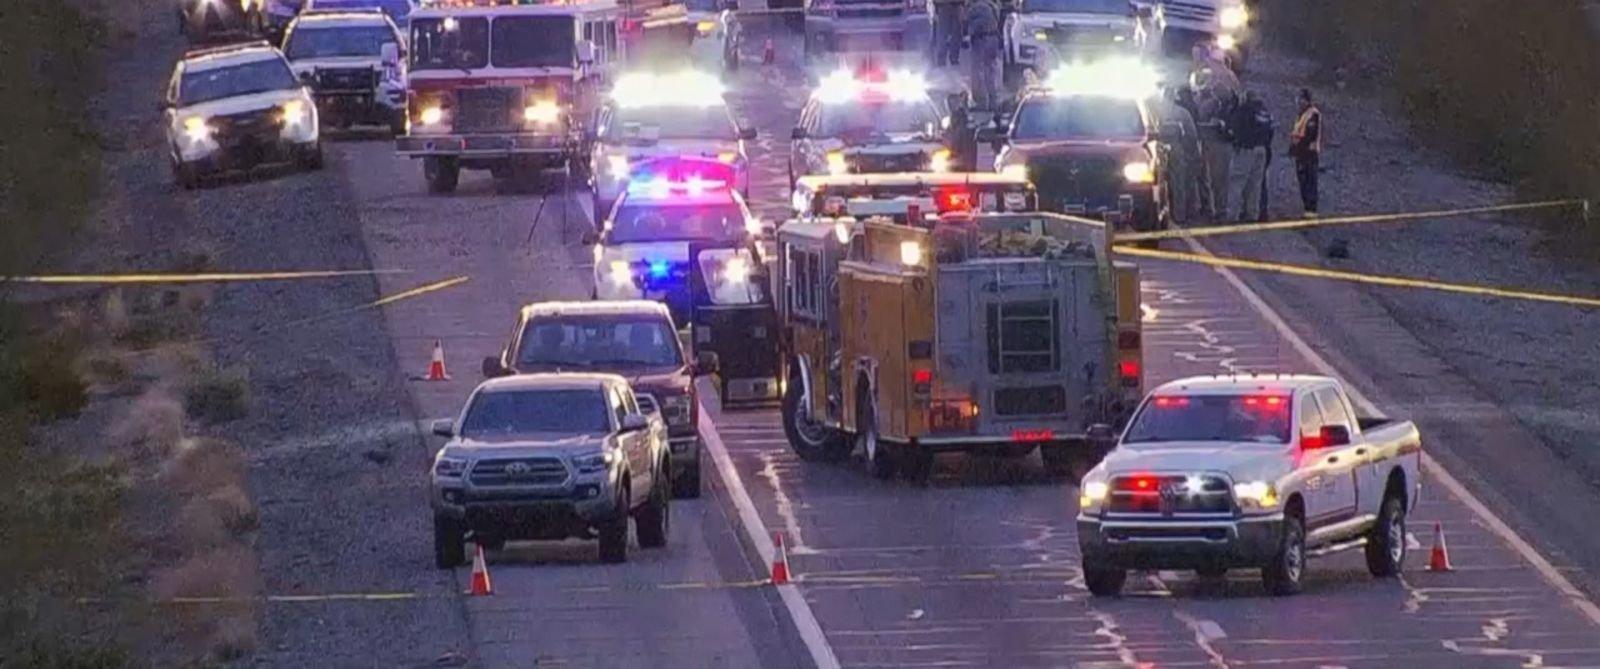 Emergency vehicles descend on scene in Tonopha Arizona where a state trooper was ambused